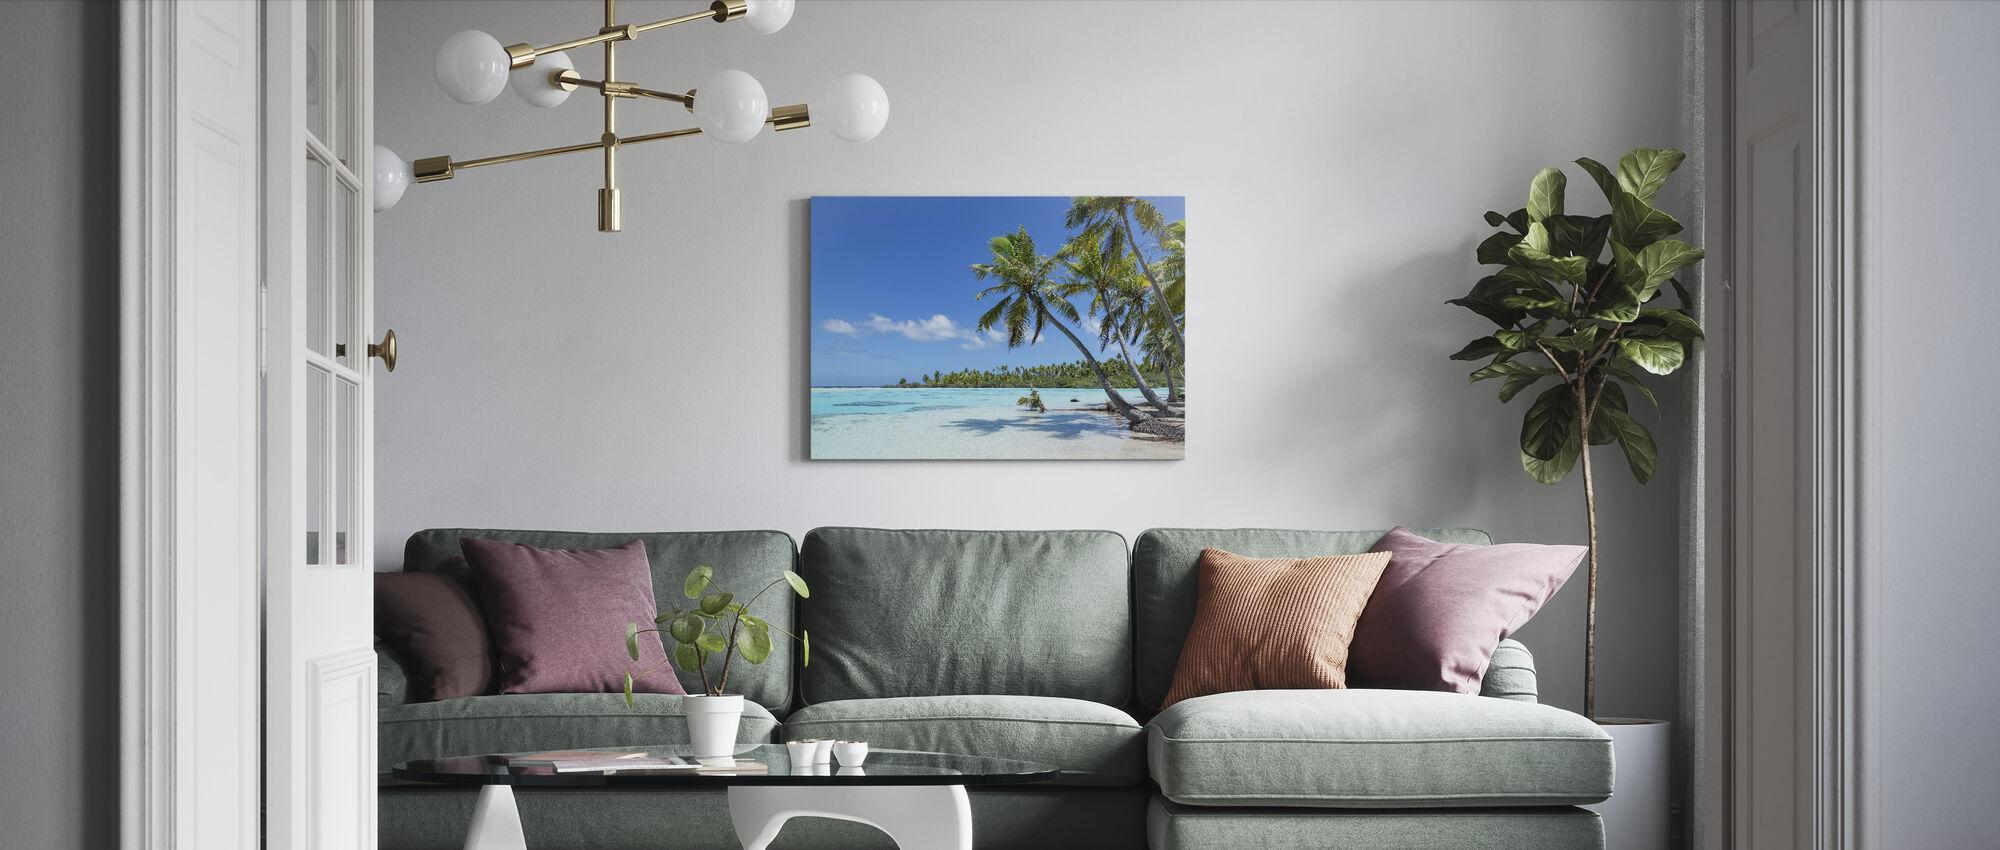 Teahatea Fakarava Frankreich - Leinwandbild - Wohnzimmer